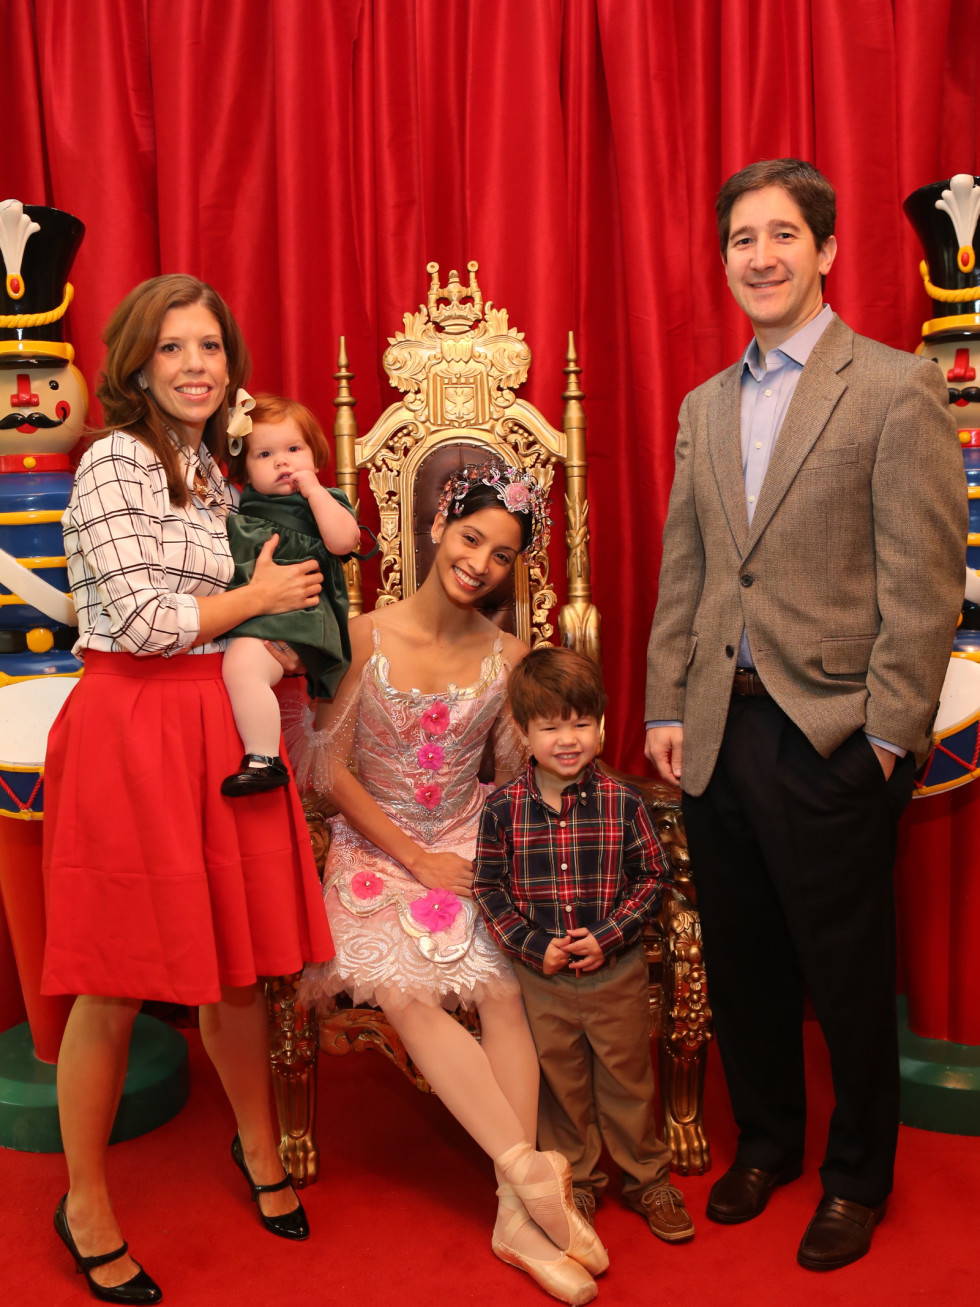 News, Houston Ballet Kingdom of Sweets , Dec. 2015, Sarah High, Lucy High, Hudson, High, Jordan High